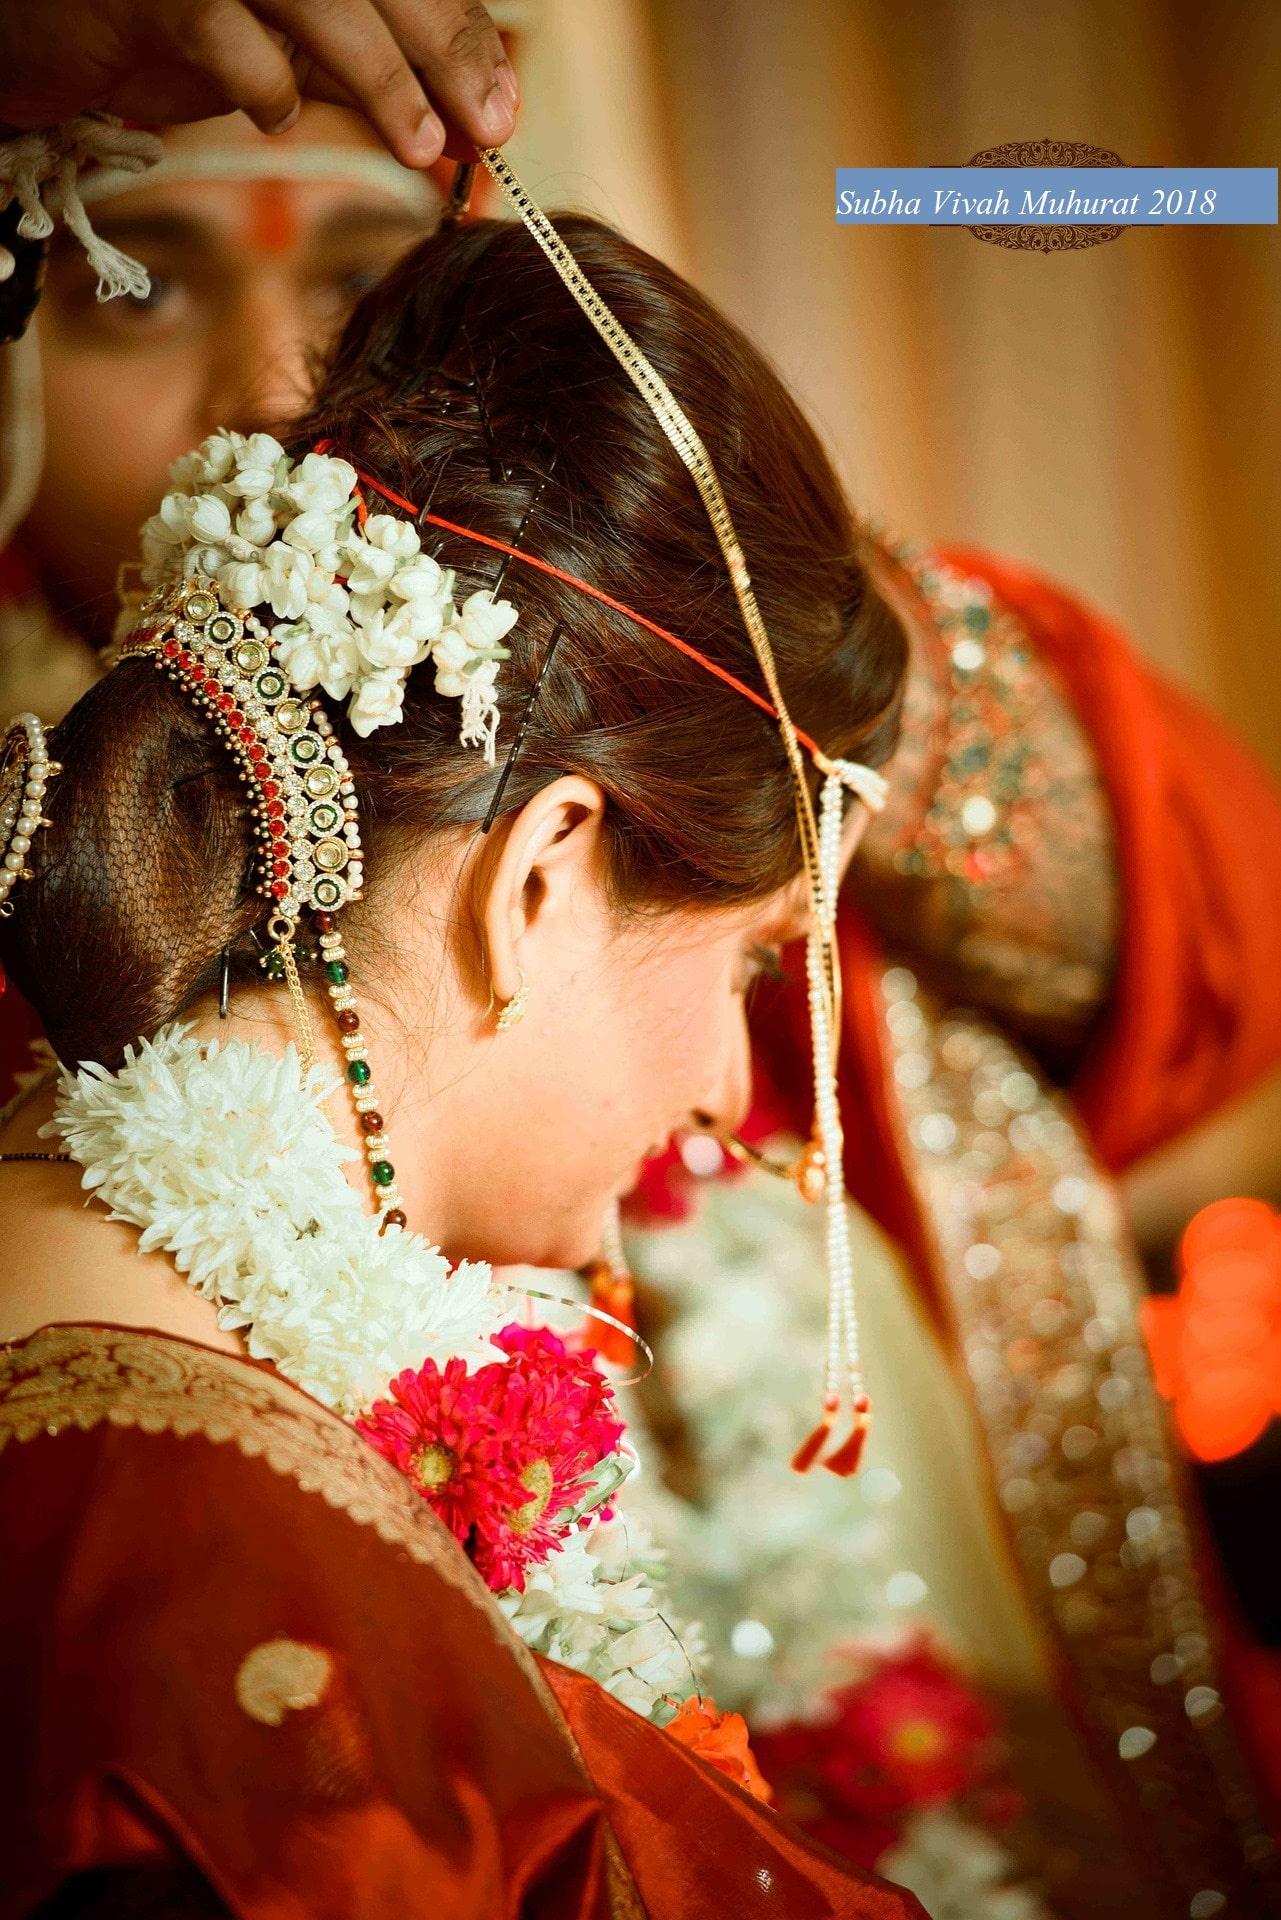 Wedding Shubh muhurat Dates 2018 | Auspicious Marriage Dates